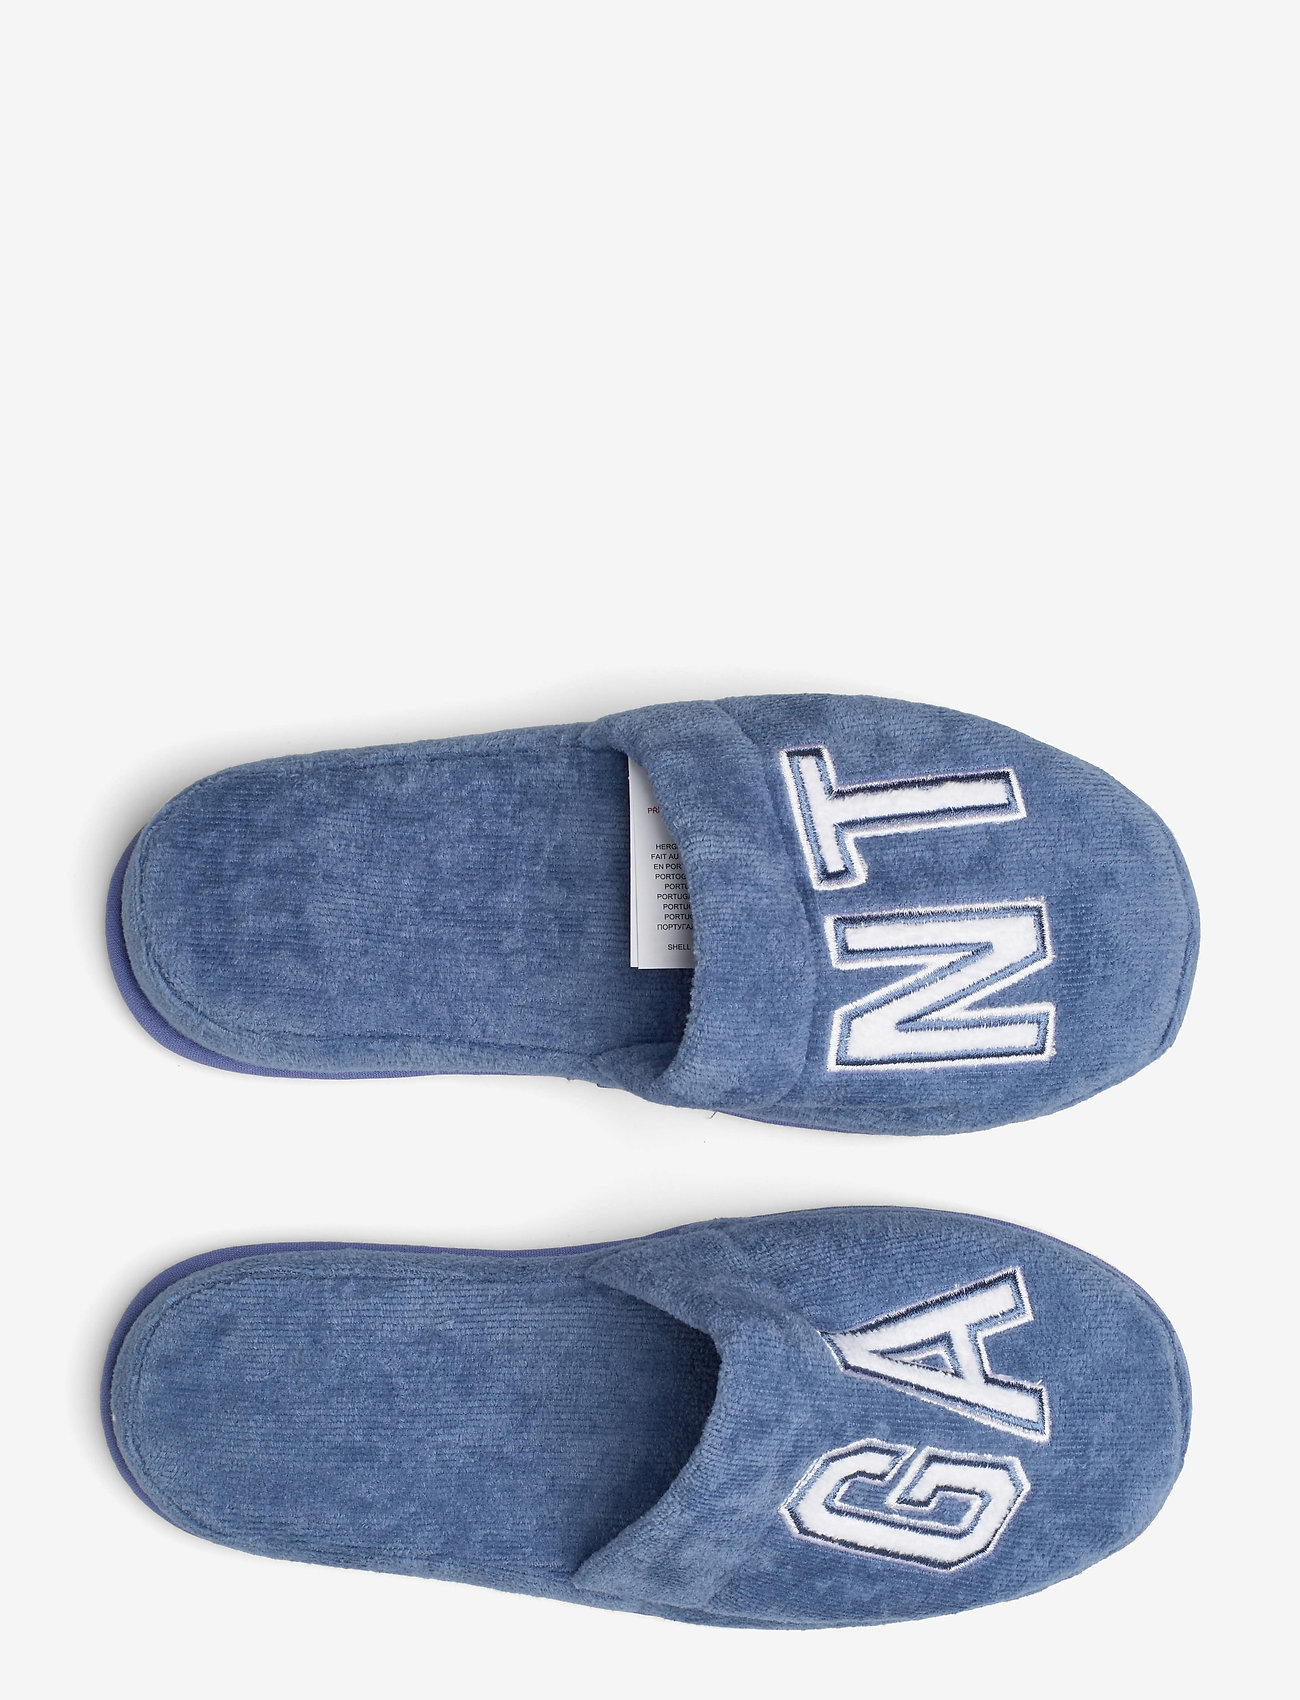 GANT - VACAY SLIPPERS - odzież - moonlight blue - 3